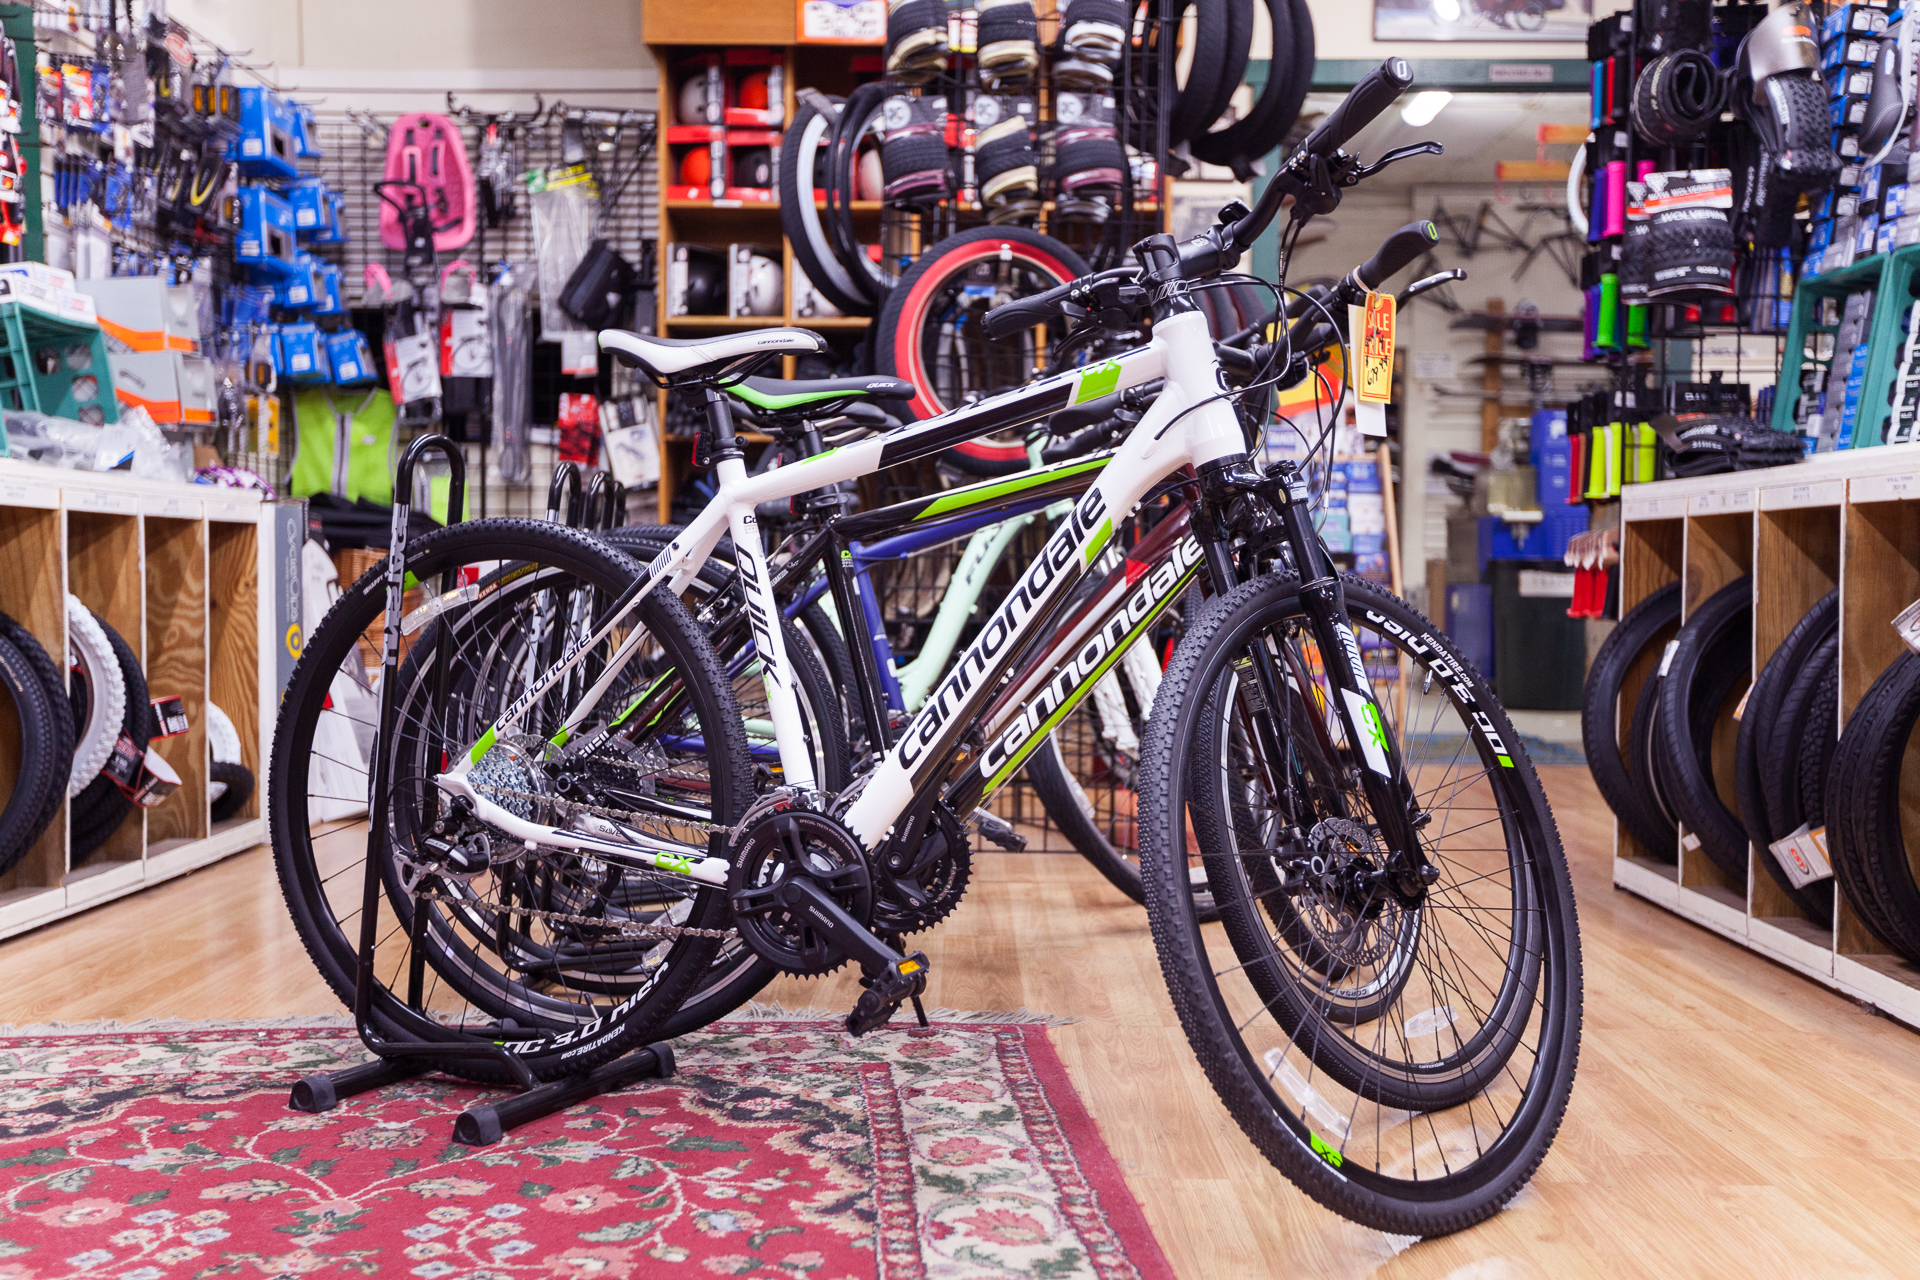 old_town_sports_novato_bike_ski_and_snowboard_shop_cannondale